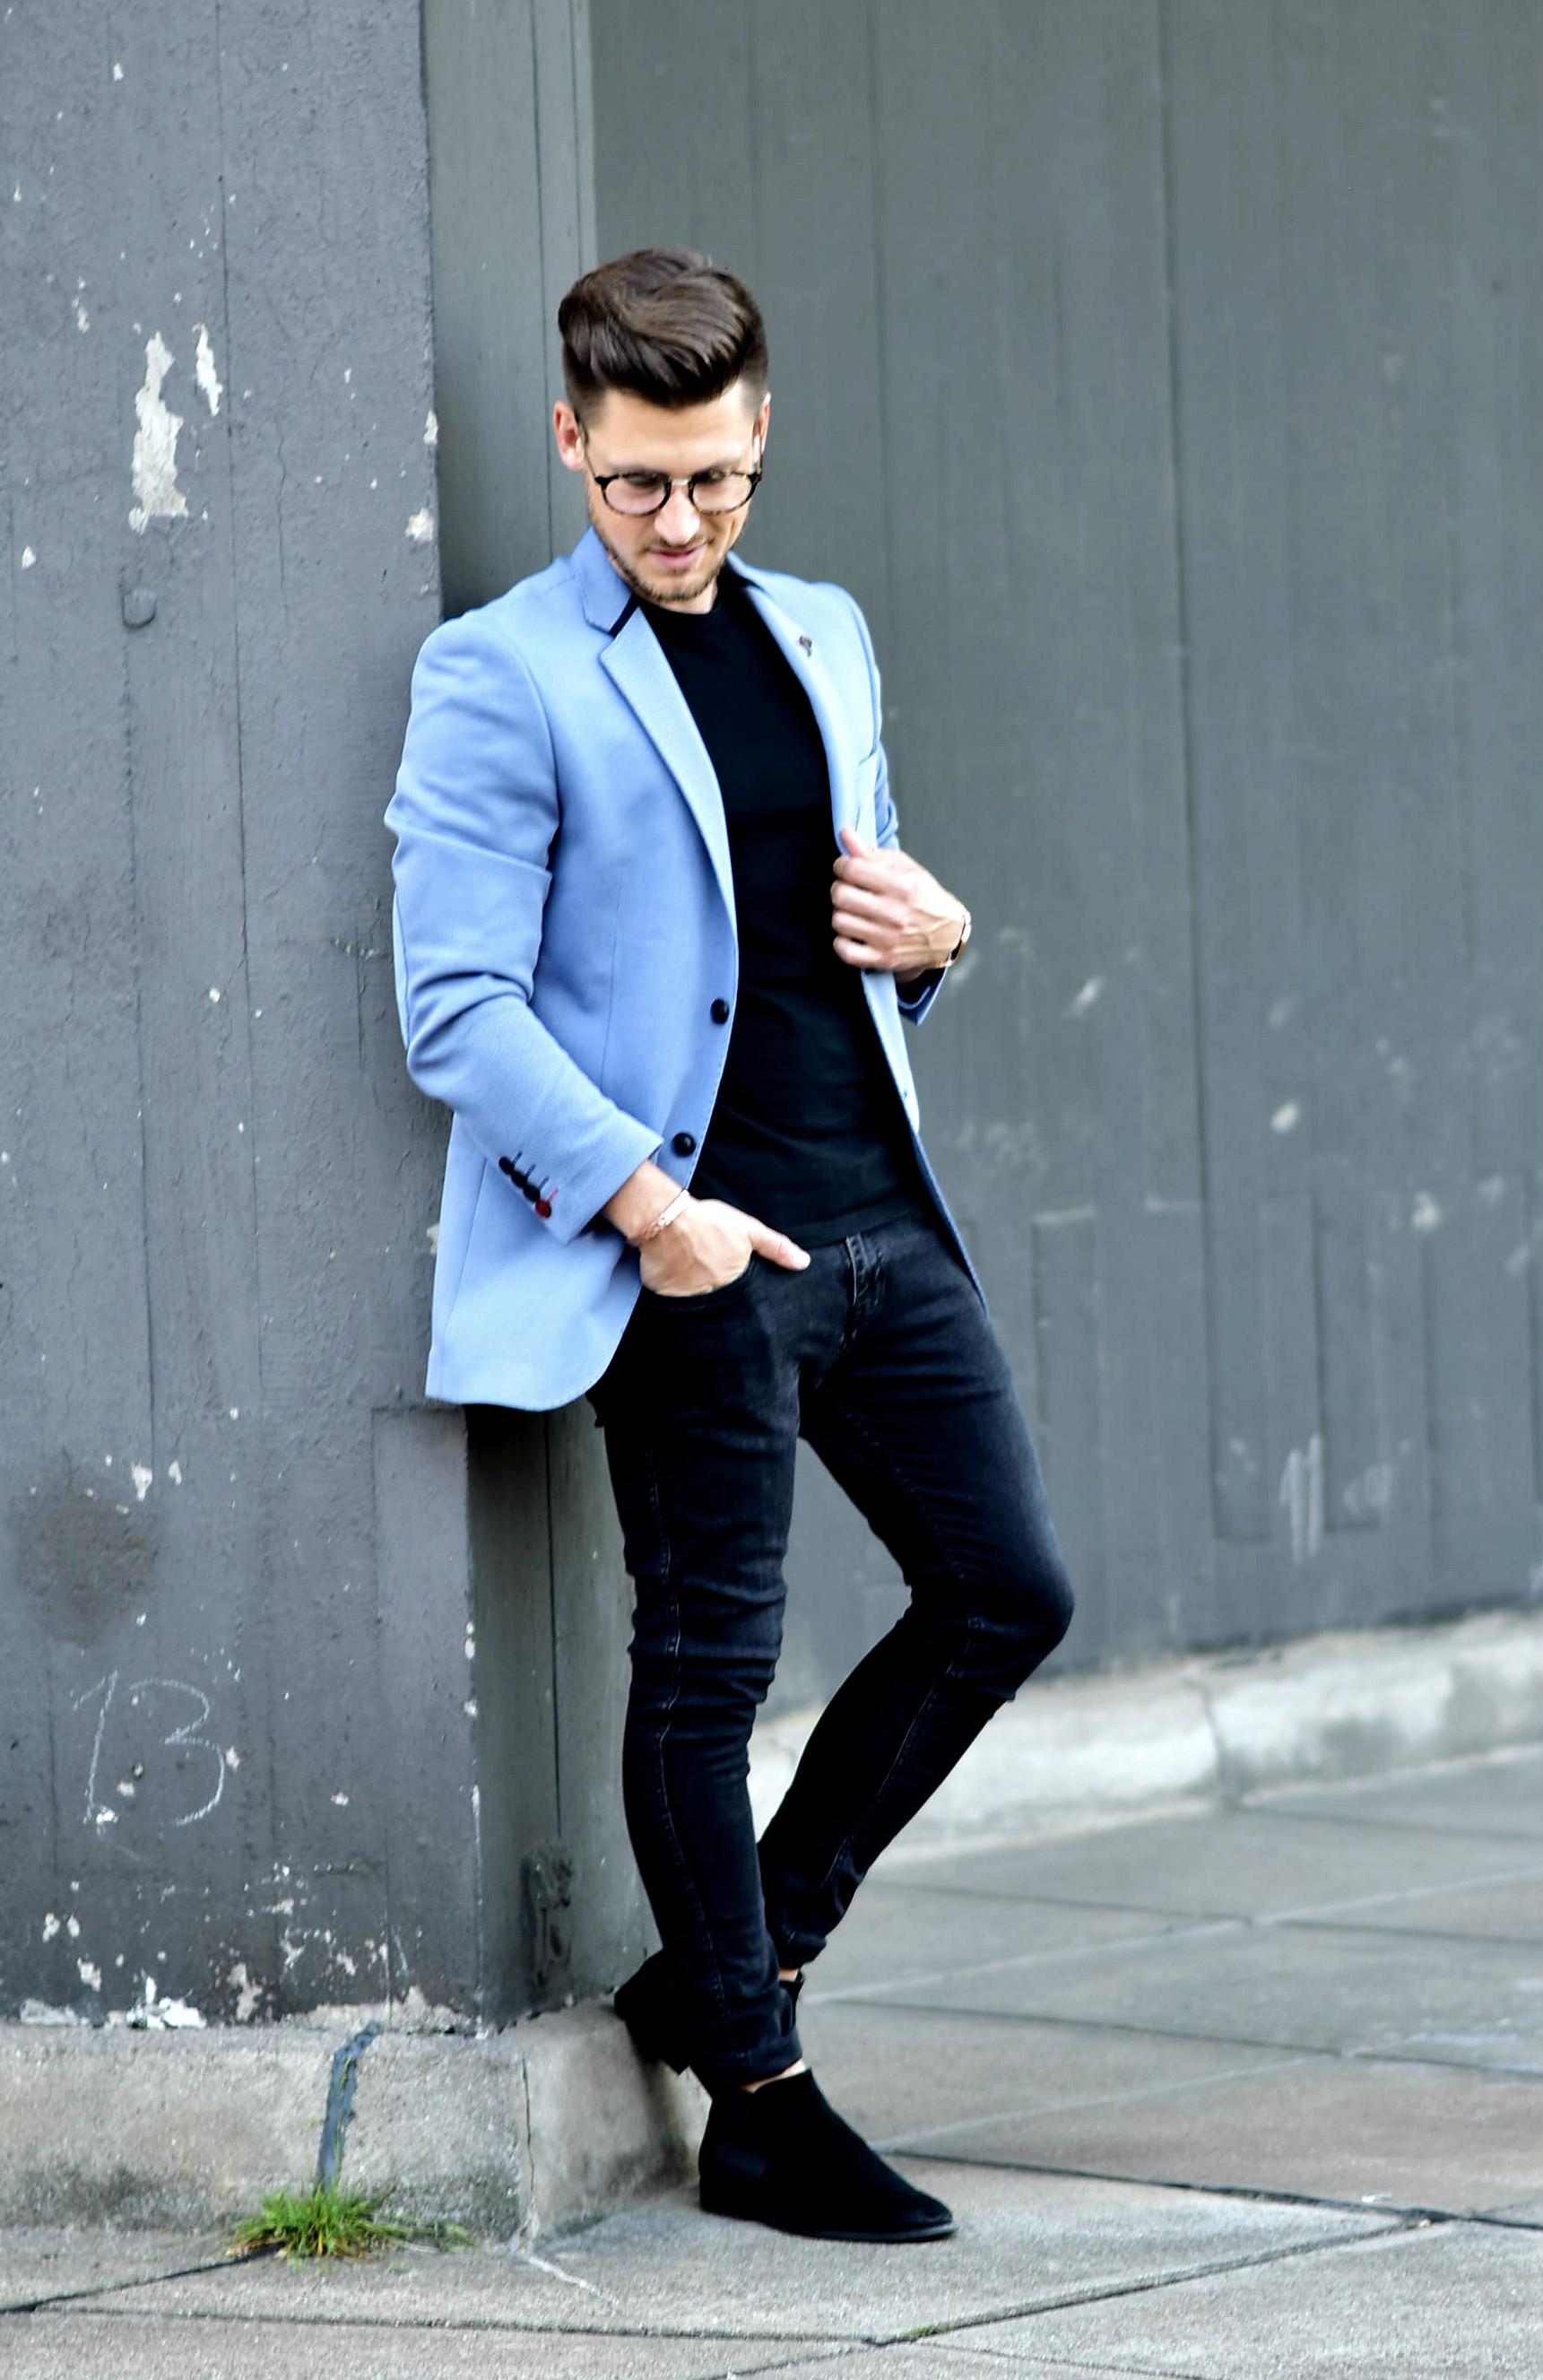 Tommeezjerry-Styleblog-Männerblog-Männer-Modeblog-Berlin-Berlinblog-Outfit-Streetlook-Royalblauer-Blazer-Royalblue-All-Black-Look-Chelsea-Boots-Skinny-Jeans-4